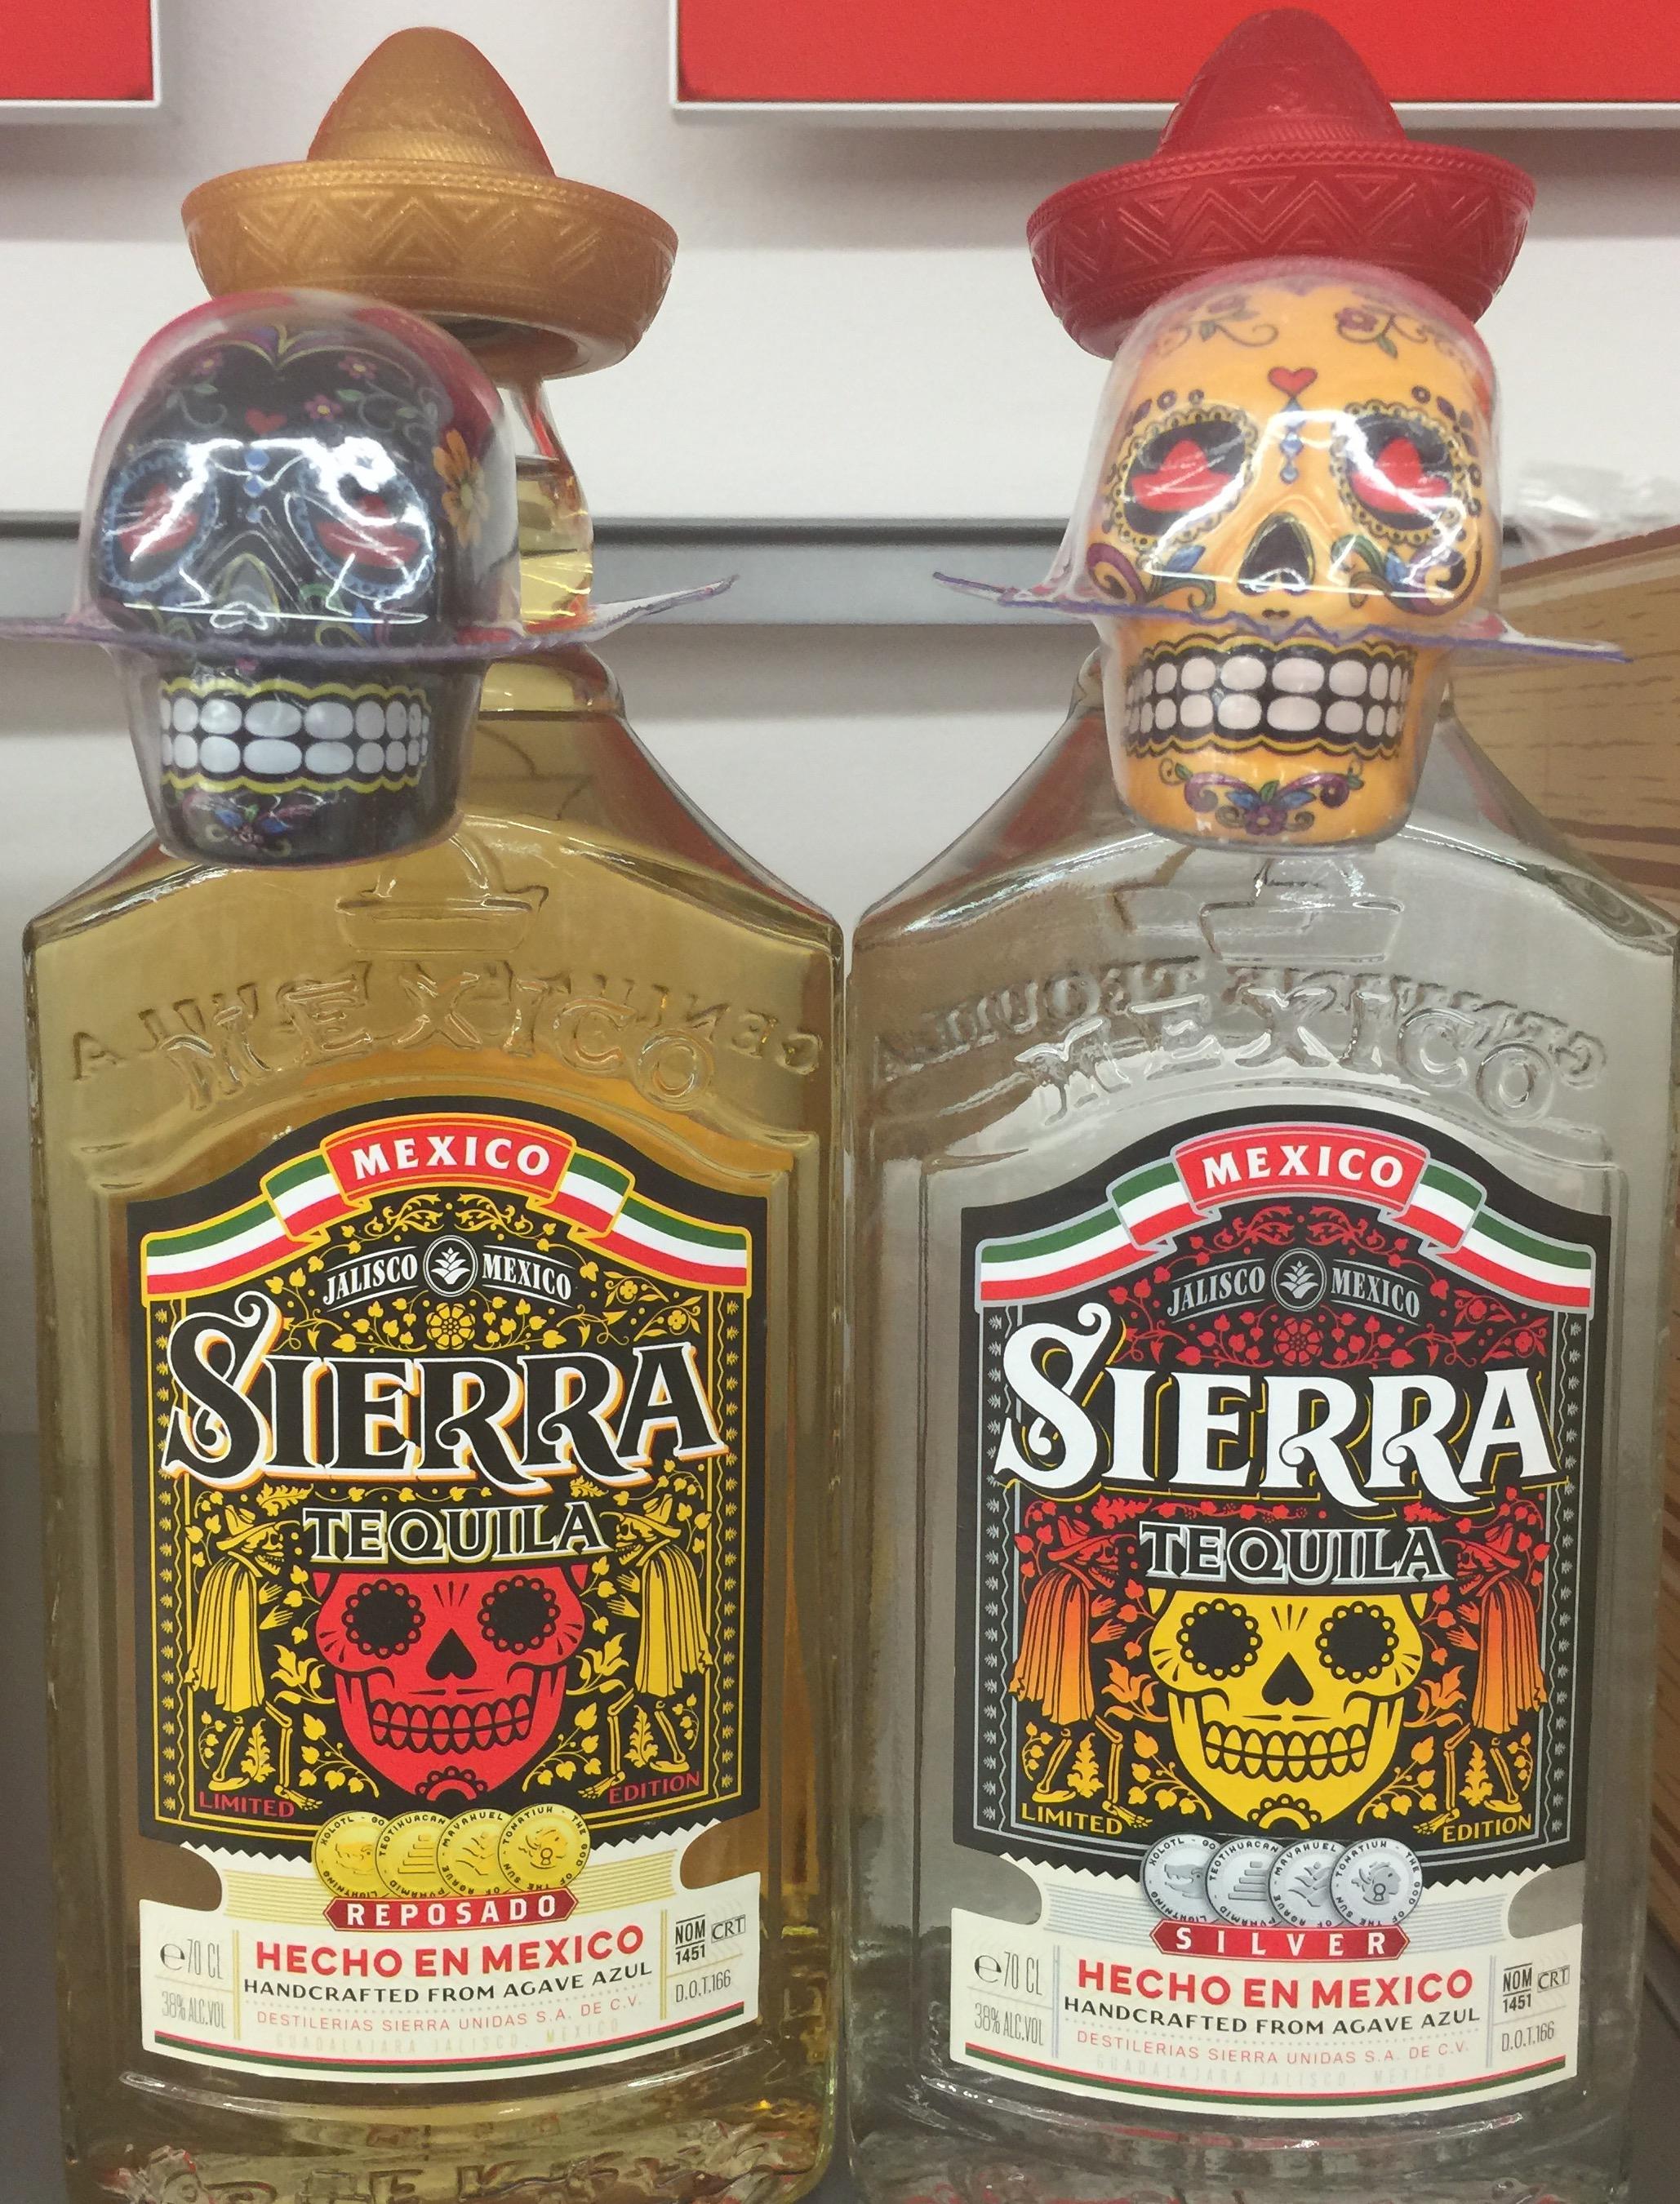 "[Penny + Netto MD] Sierra Tequila ""Are you Loco""-Edition mit Totenkopf-Salz/Zimtstreuer Silver und Reposado je 9,99€"